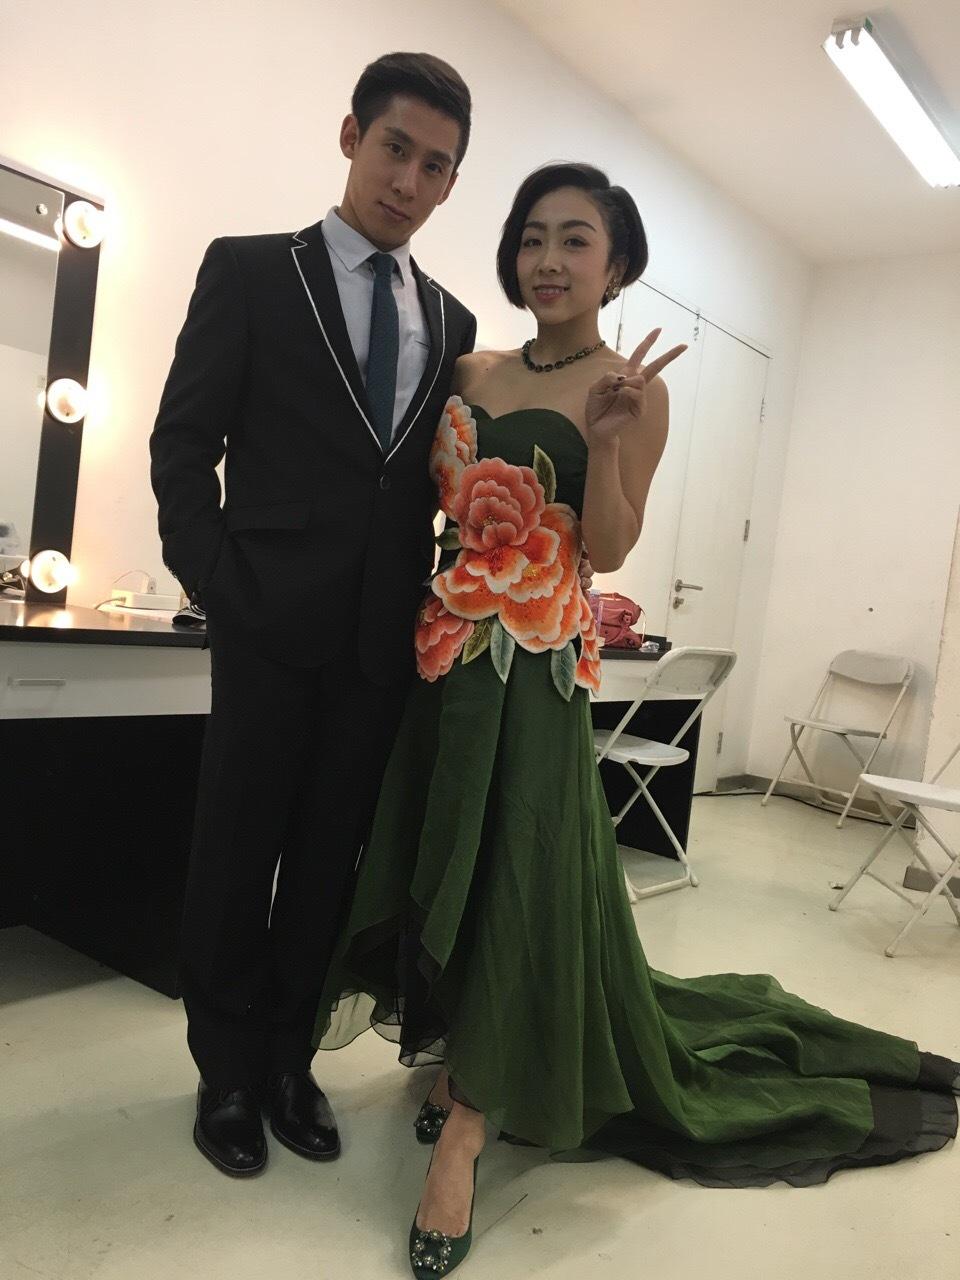 Вэньцзин Суй - Цун Хань / Wenjing SUI - Cong HAN CHN - Страница 4 Auvl5